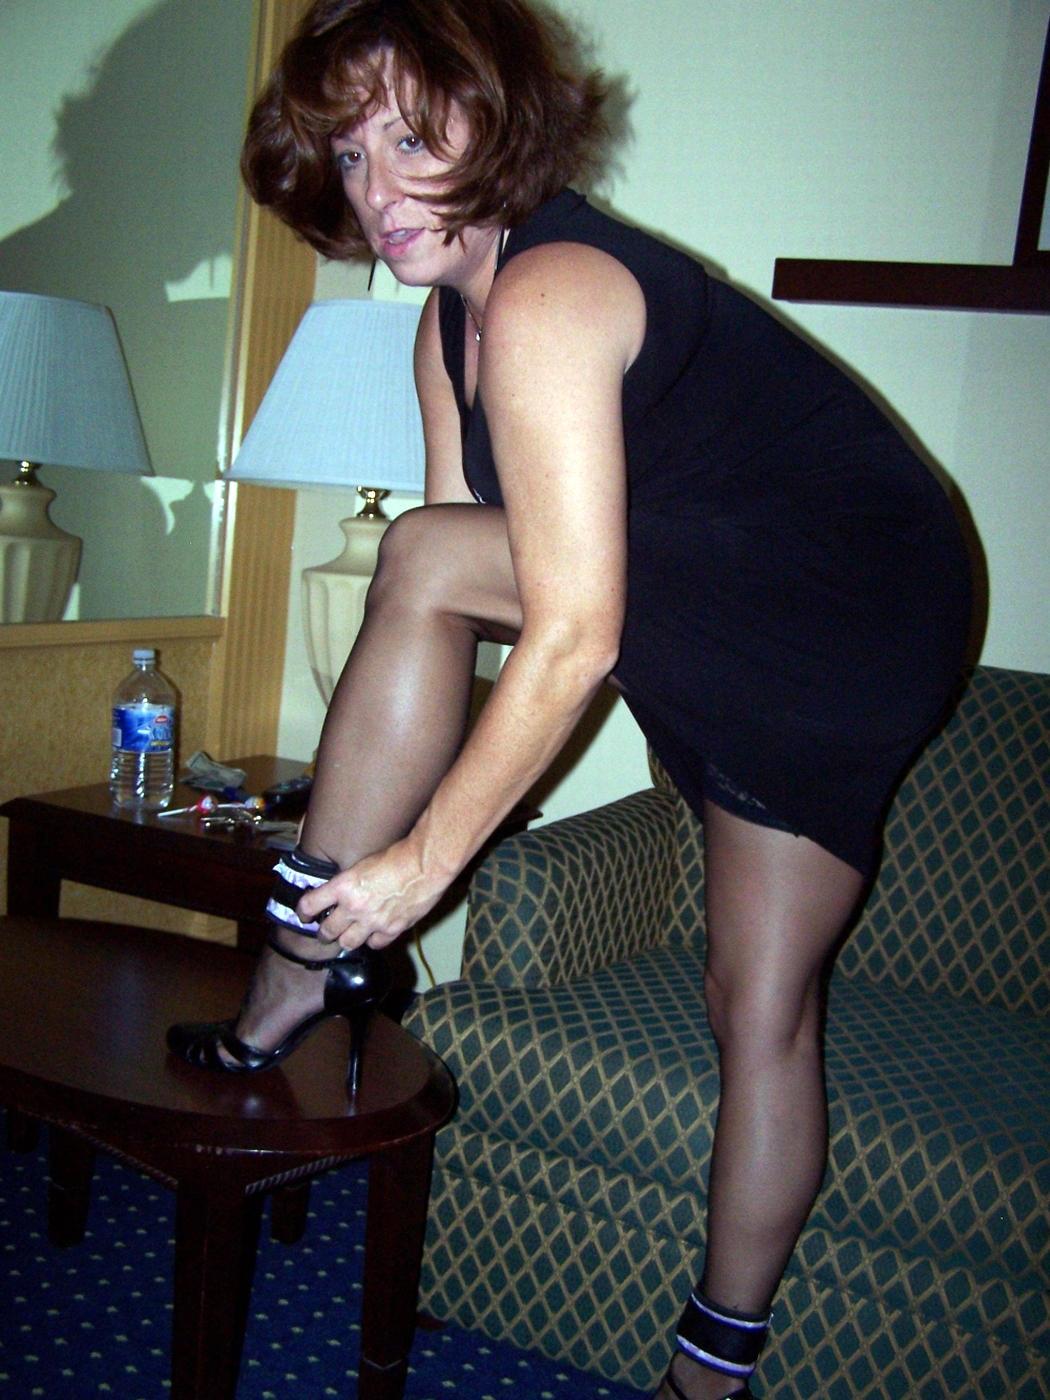 http://pbs-2.adult-empire.com/85/8570/042/pic/9.jpg